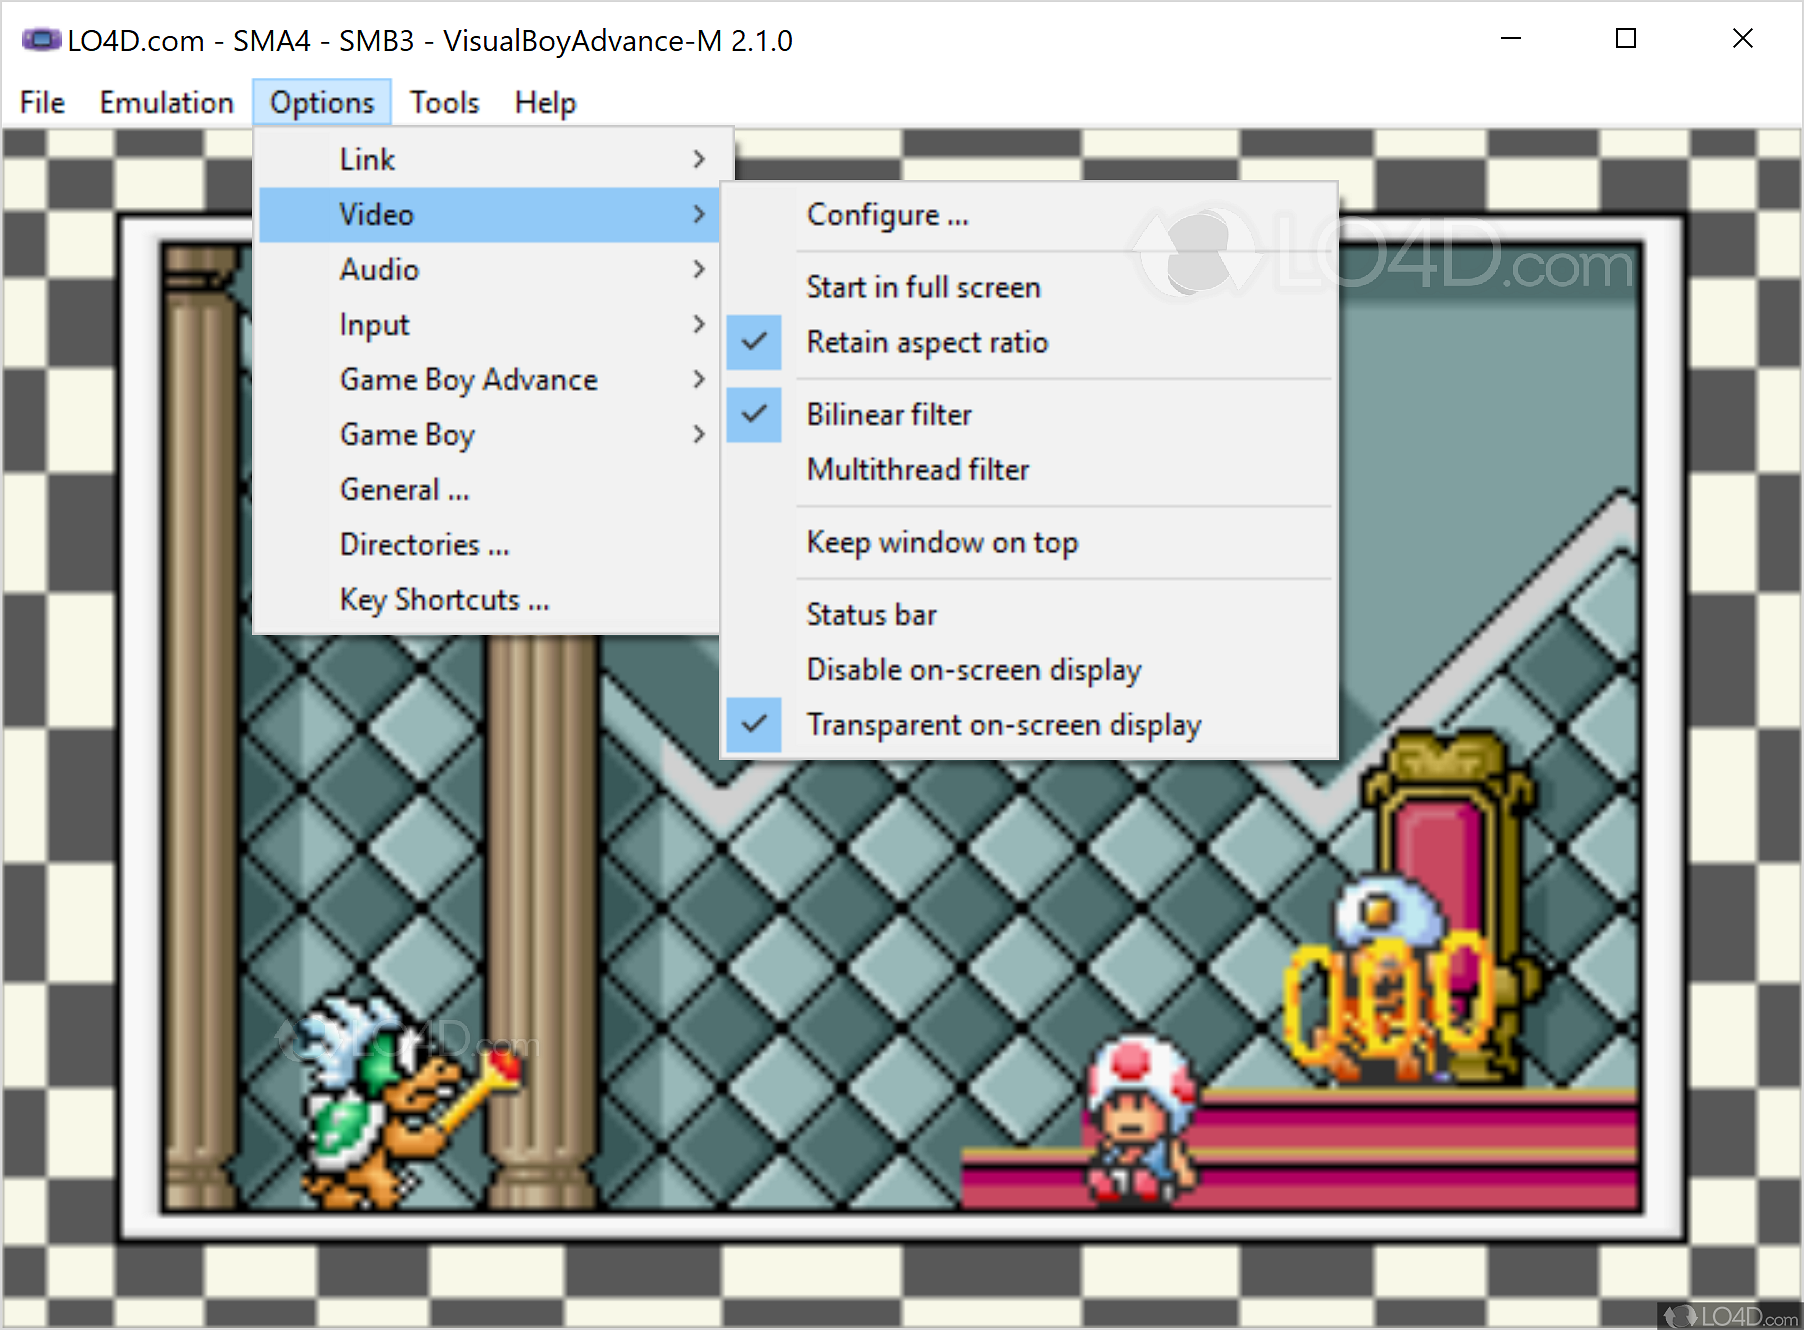 download vba emulator for android